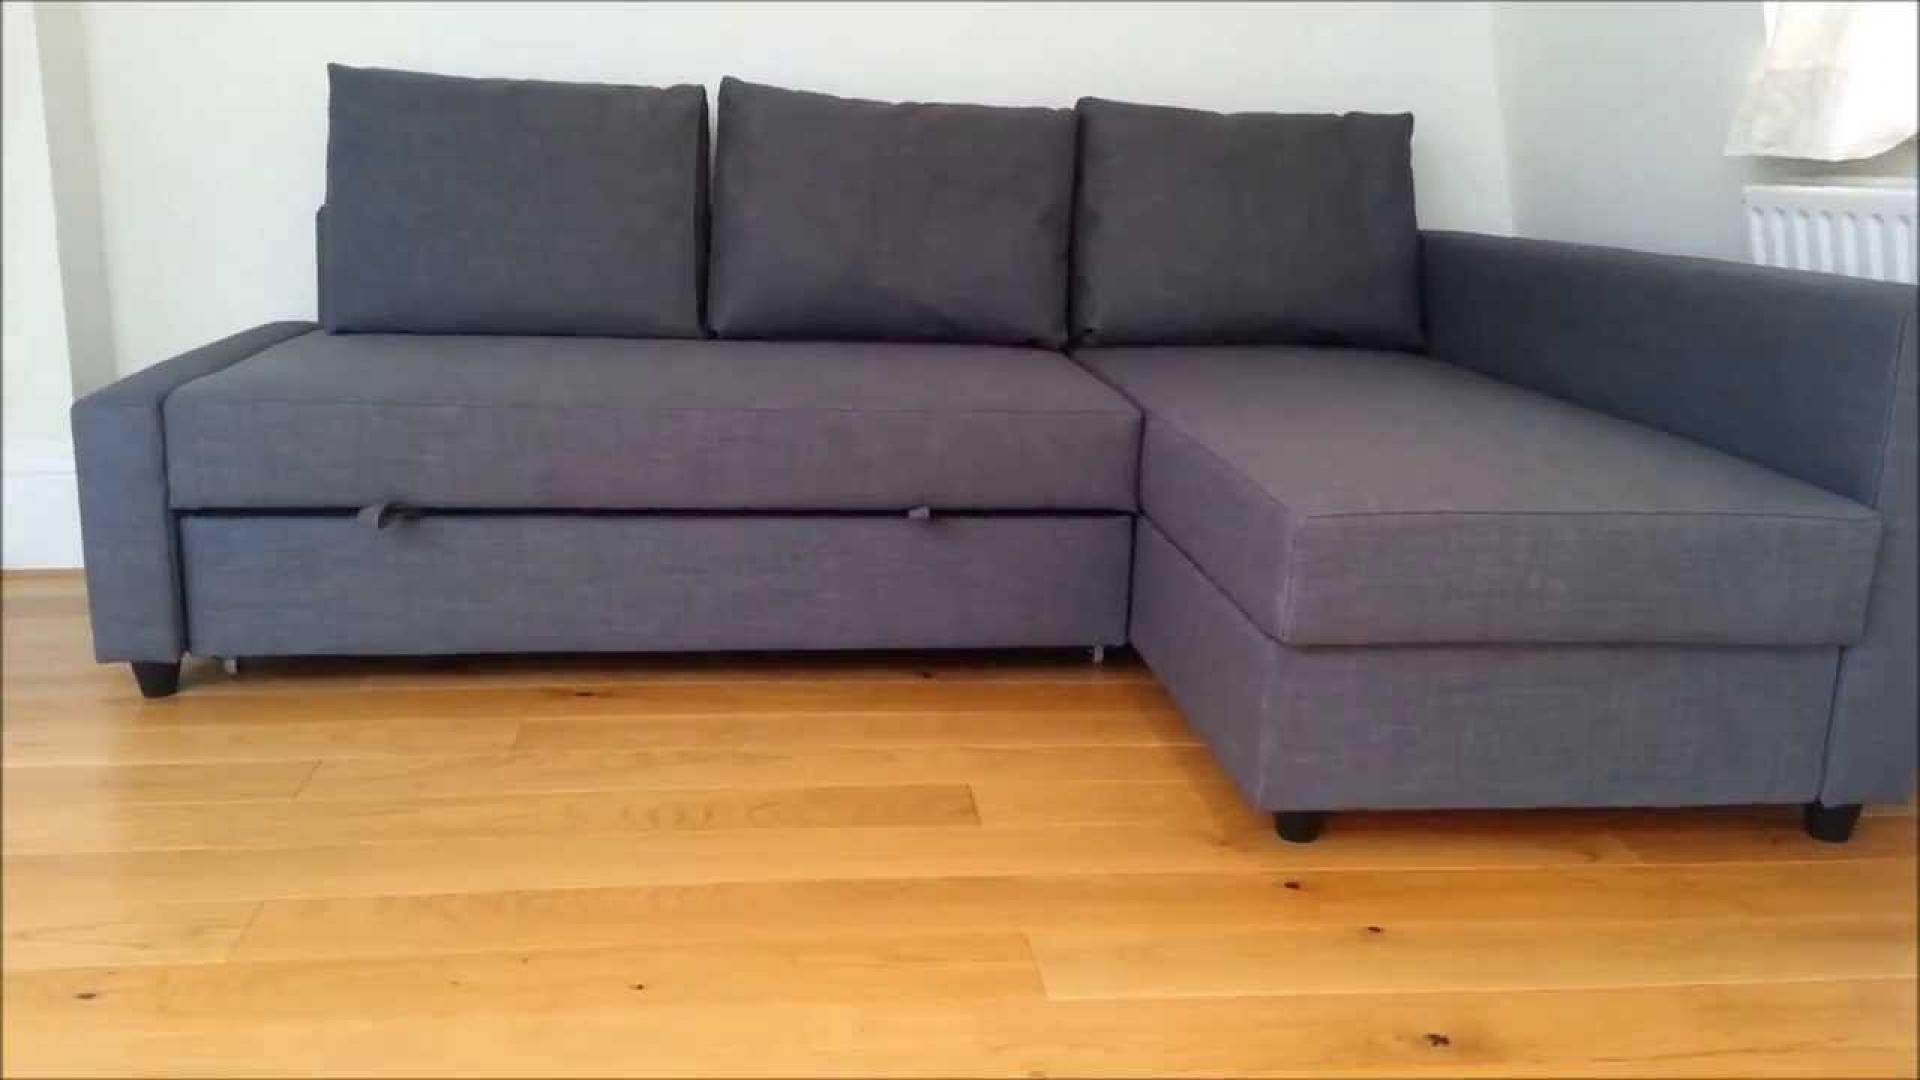 Photos Canapé Convertible Ikea Friheten concernant Housse Canape Angle Friheten